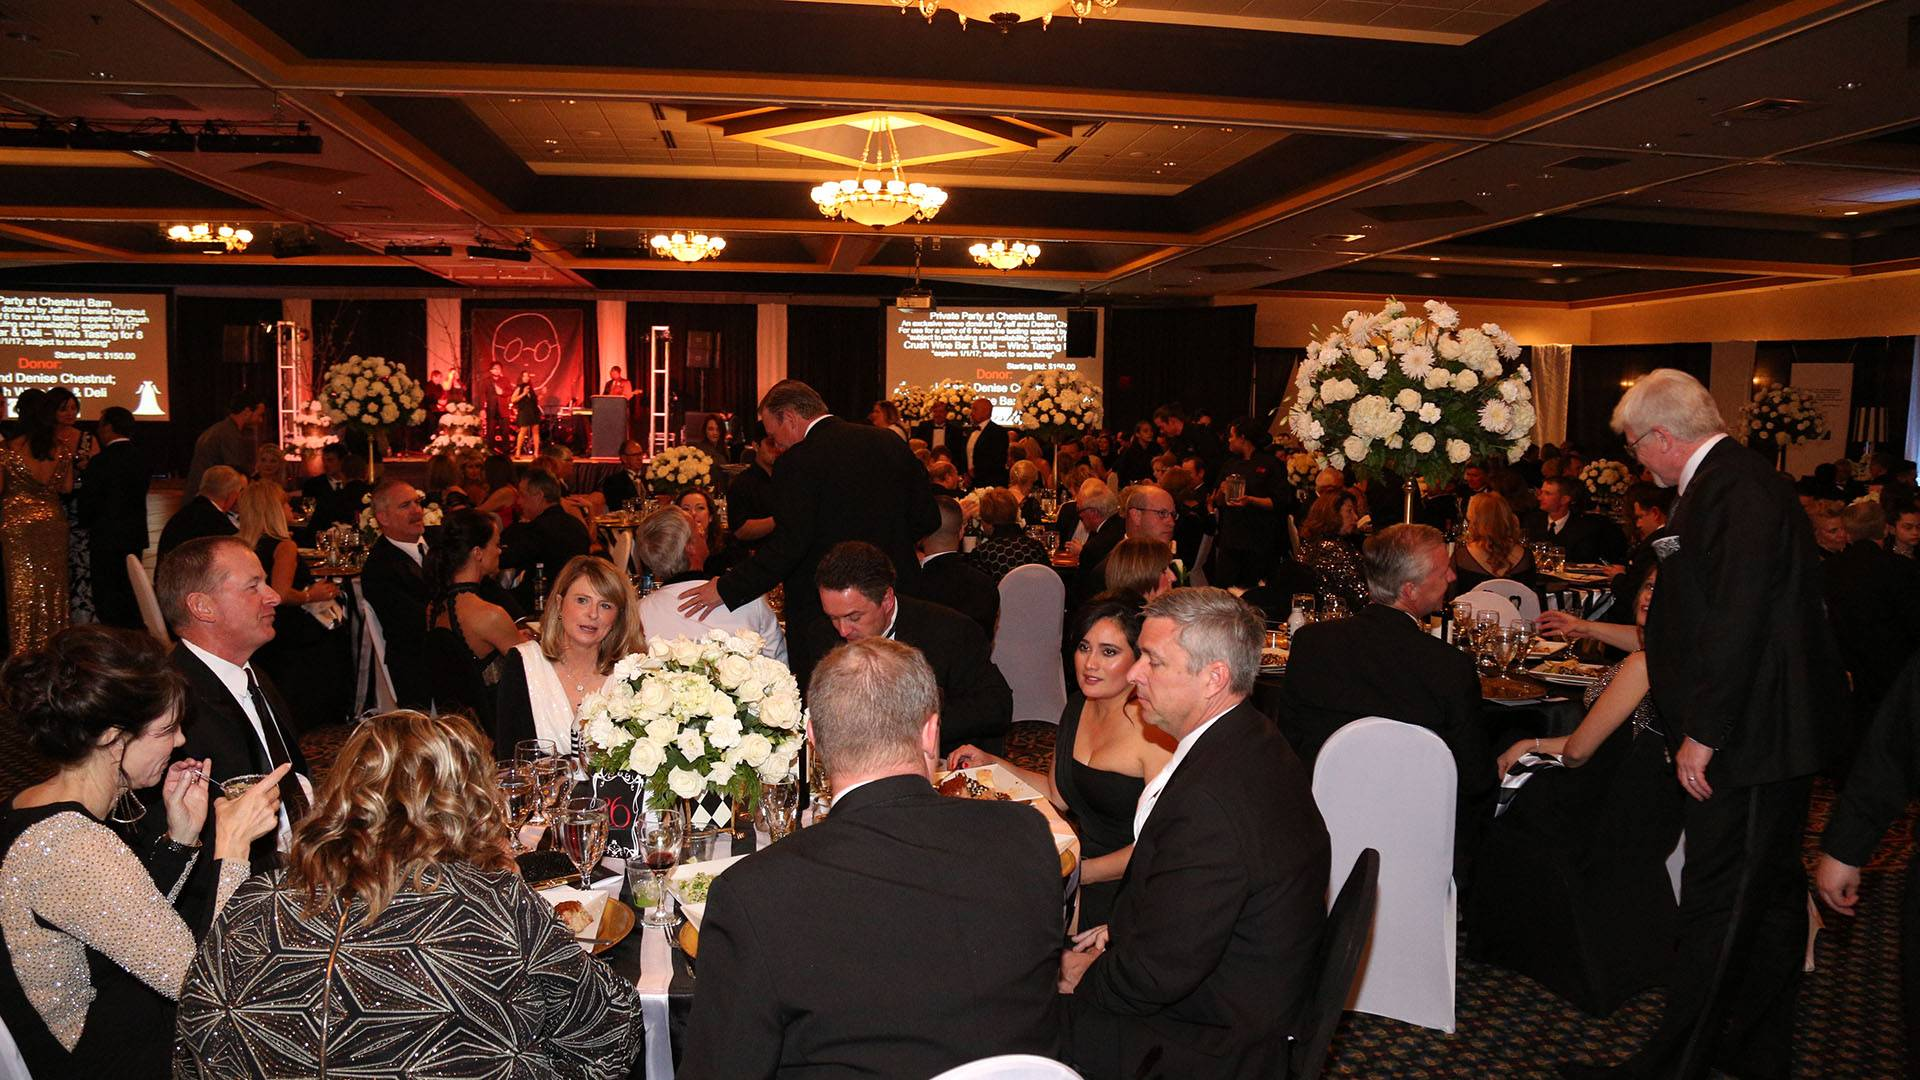 Restaurant roundup amarillo 2017 - February Fundraiser Roundup Symphony Ball Heroes Legends With Cal Ripken Jr More